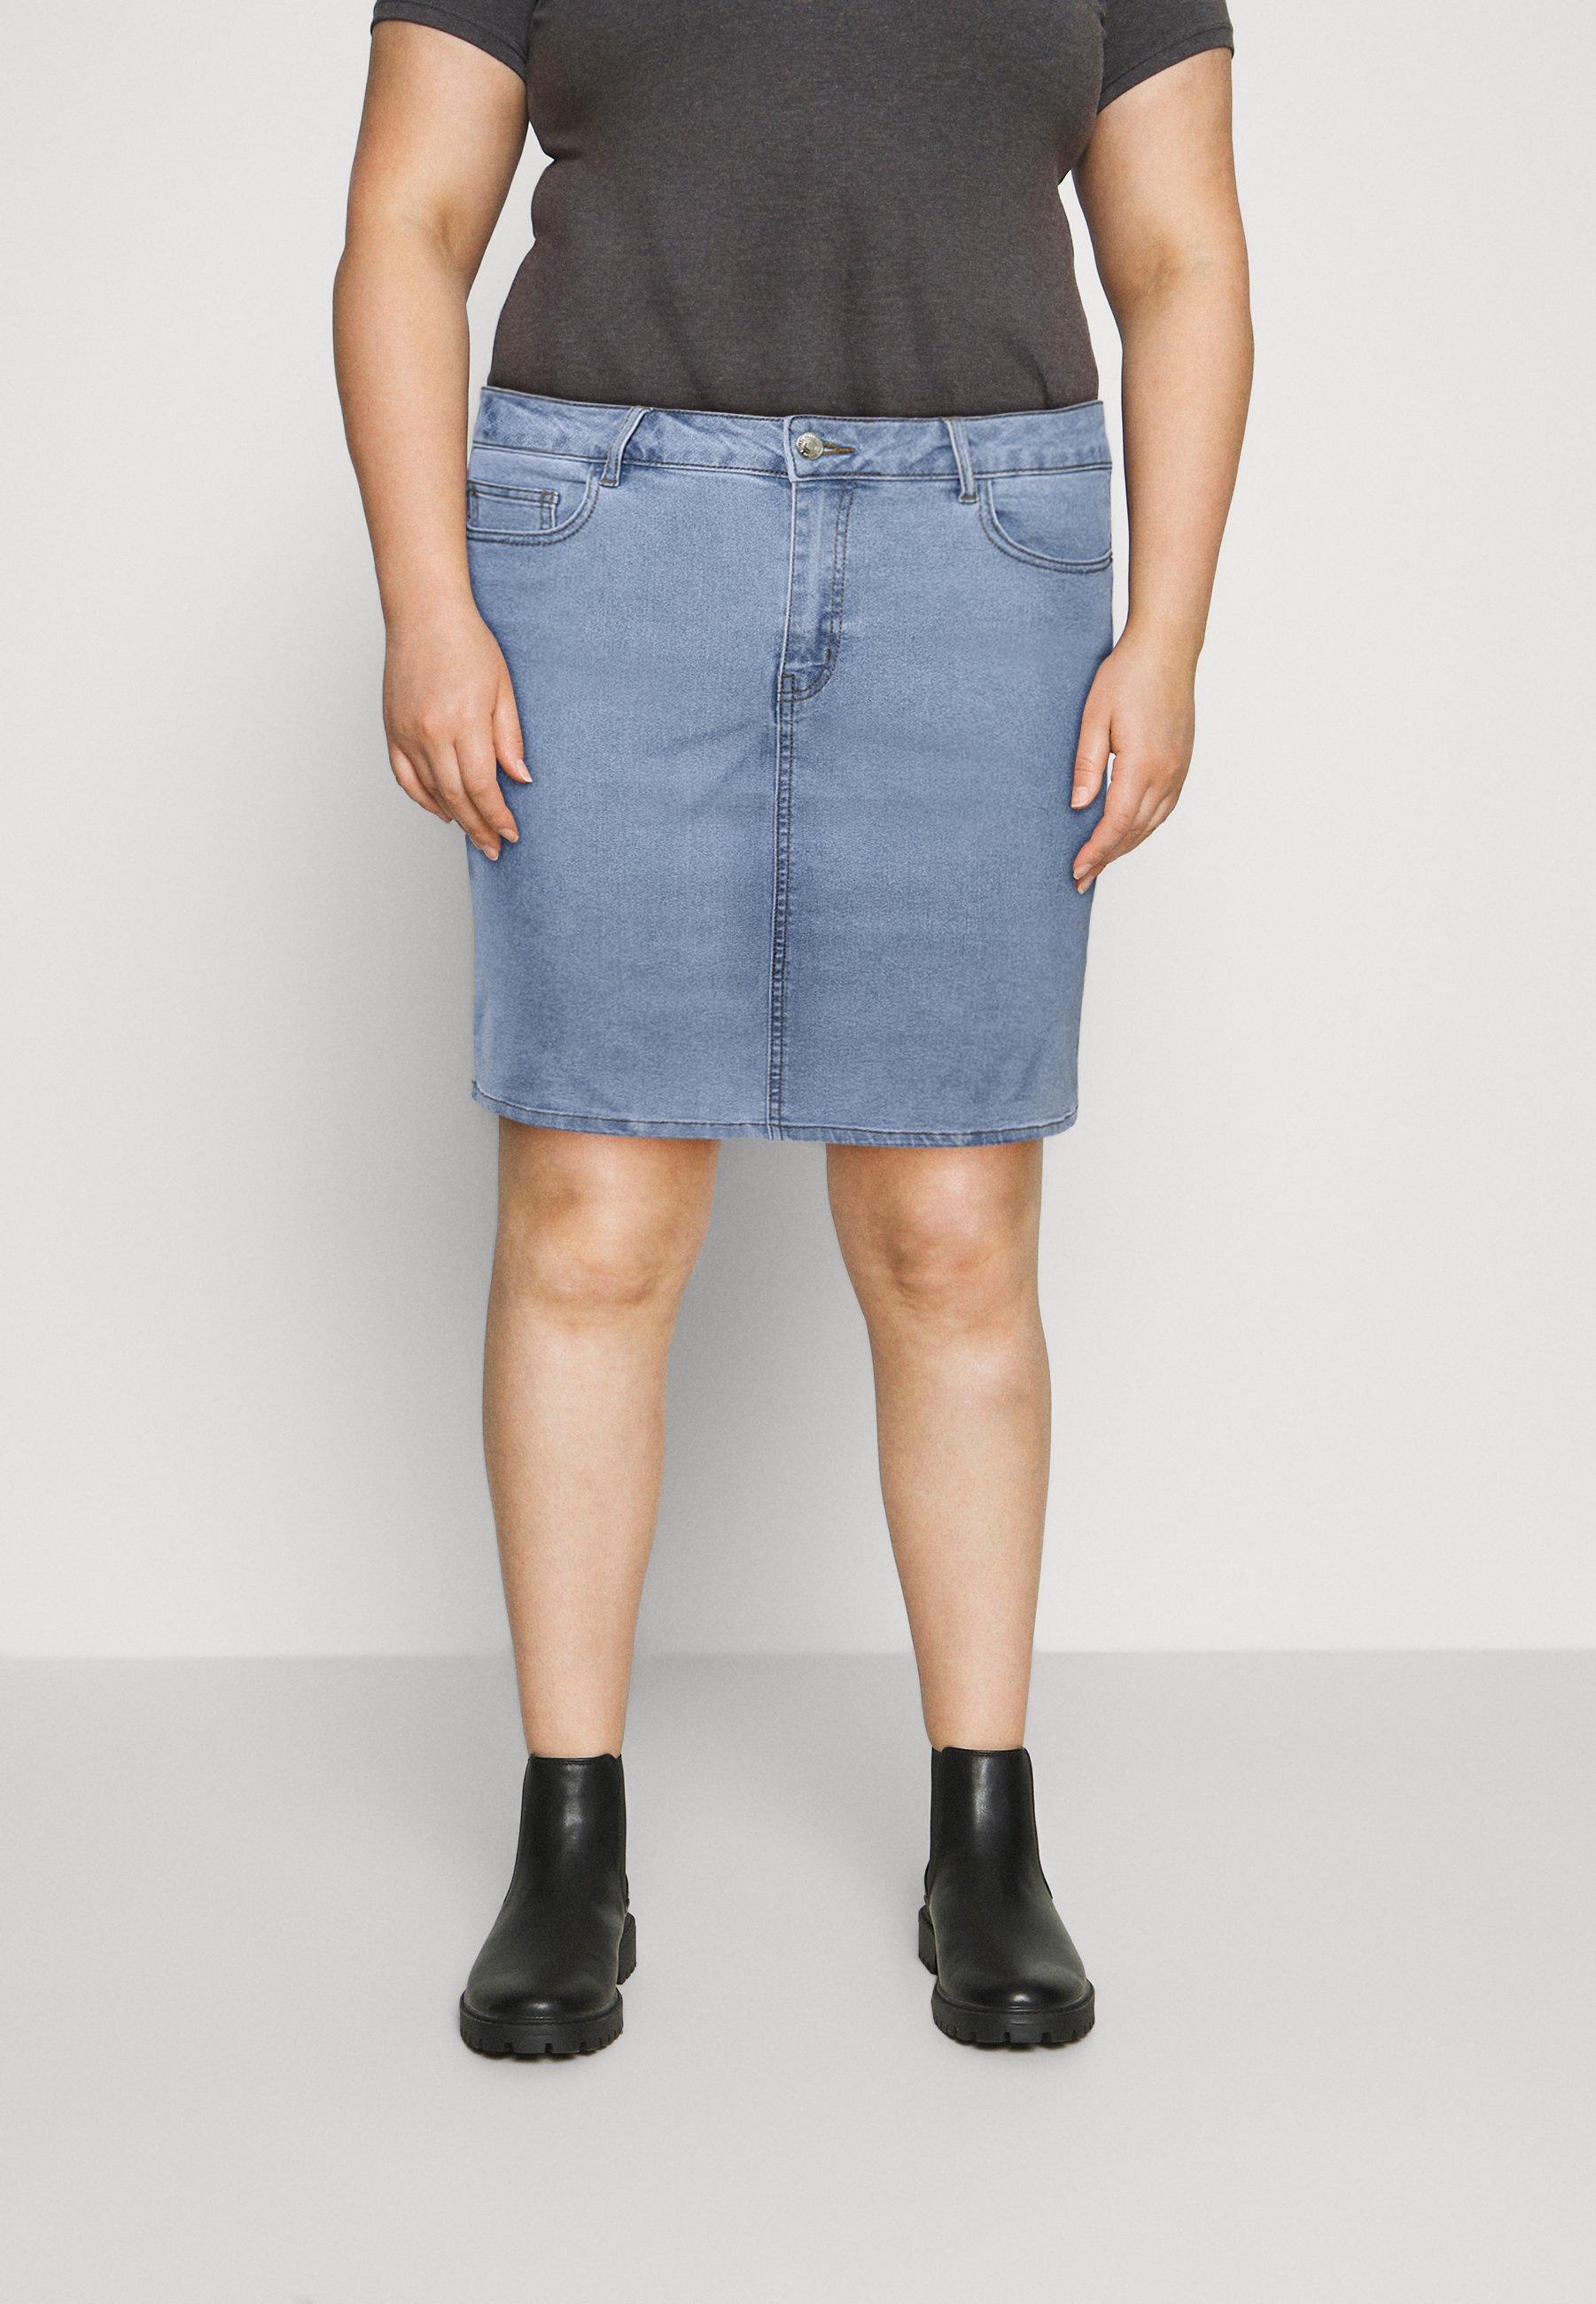 Femme VMHOT PENCIL SKIRT - Minijupe